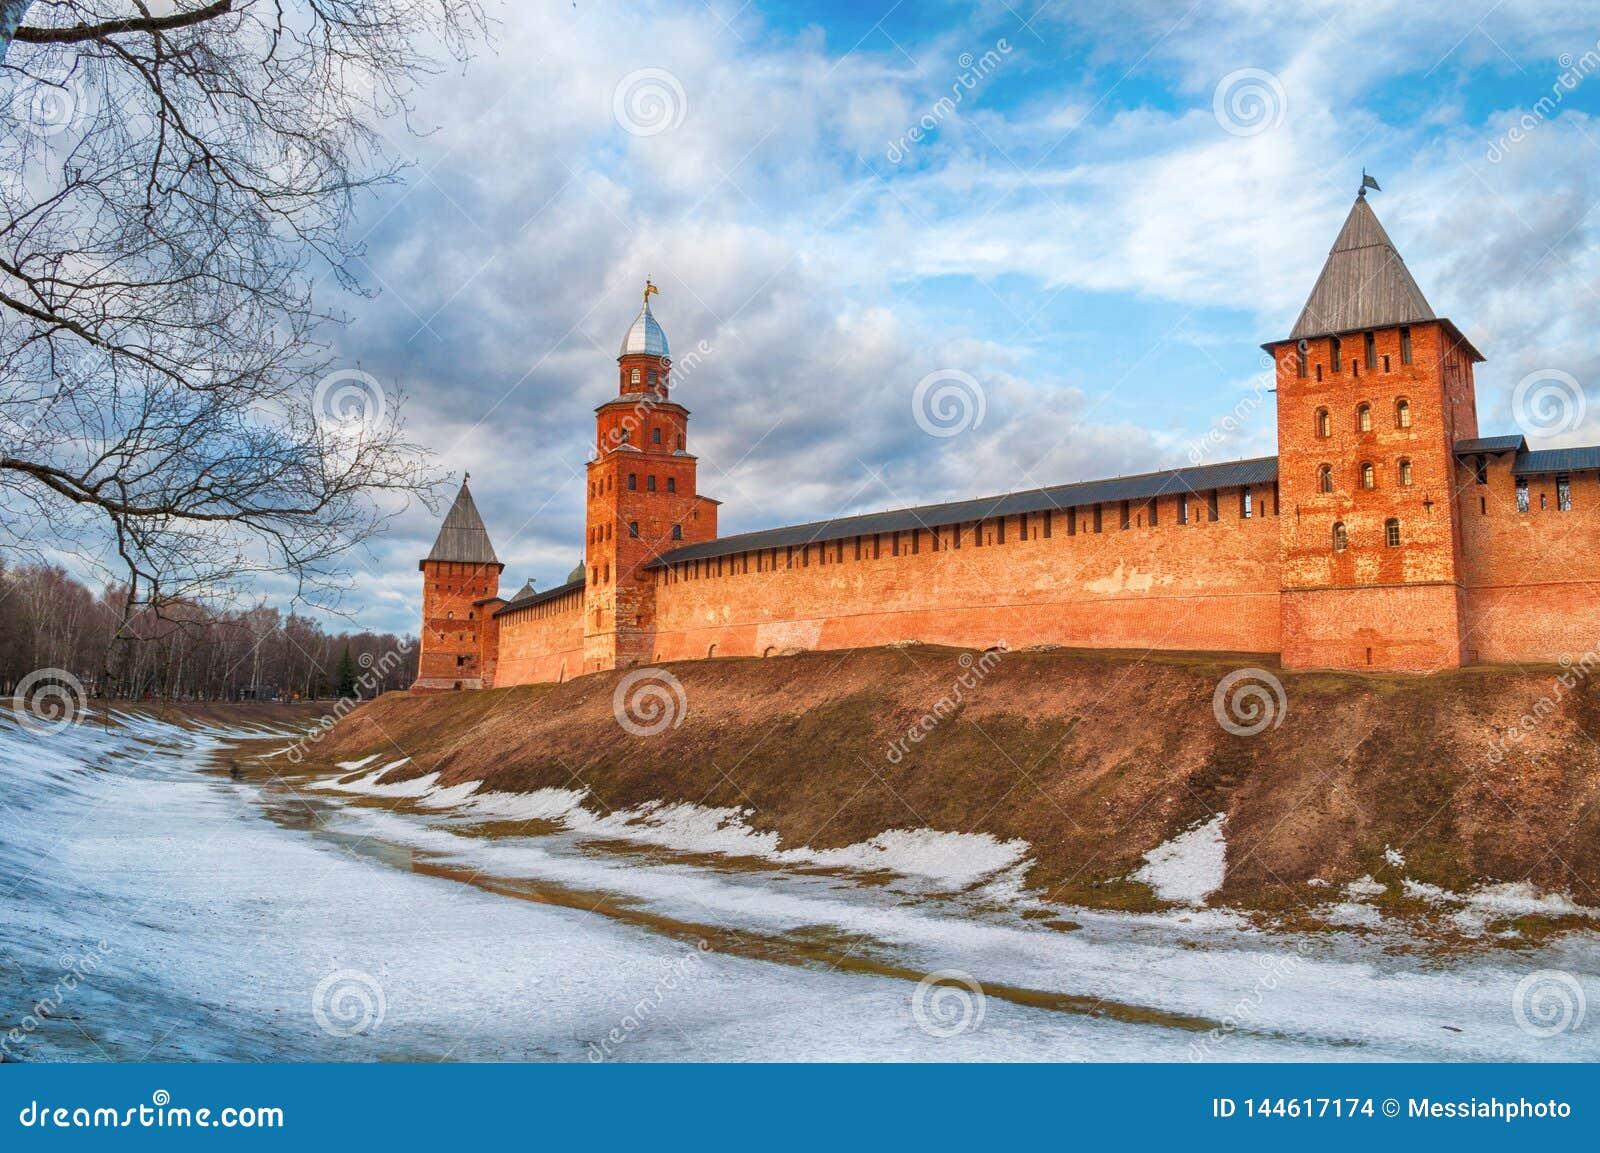 De torens van Velikynovgorod het Kremlin in vroege de lenteavond in Veliky Novgorod, Rusland, panorama